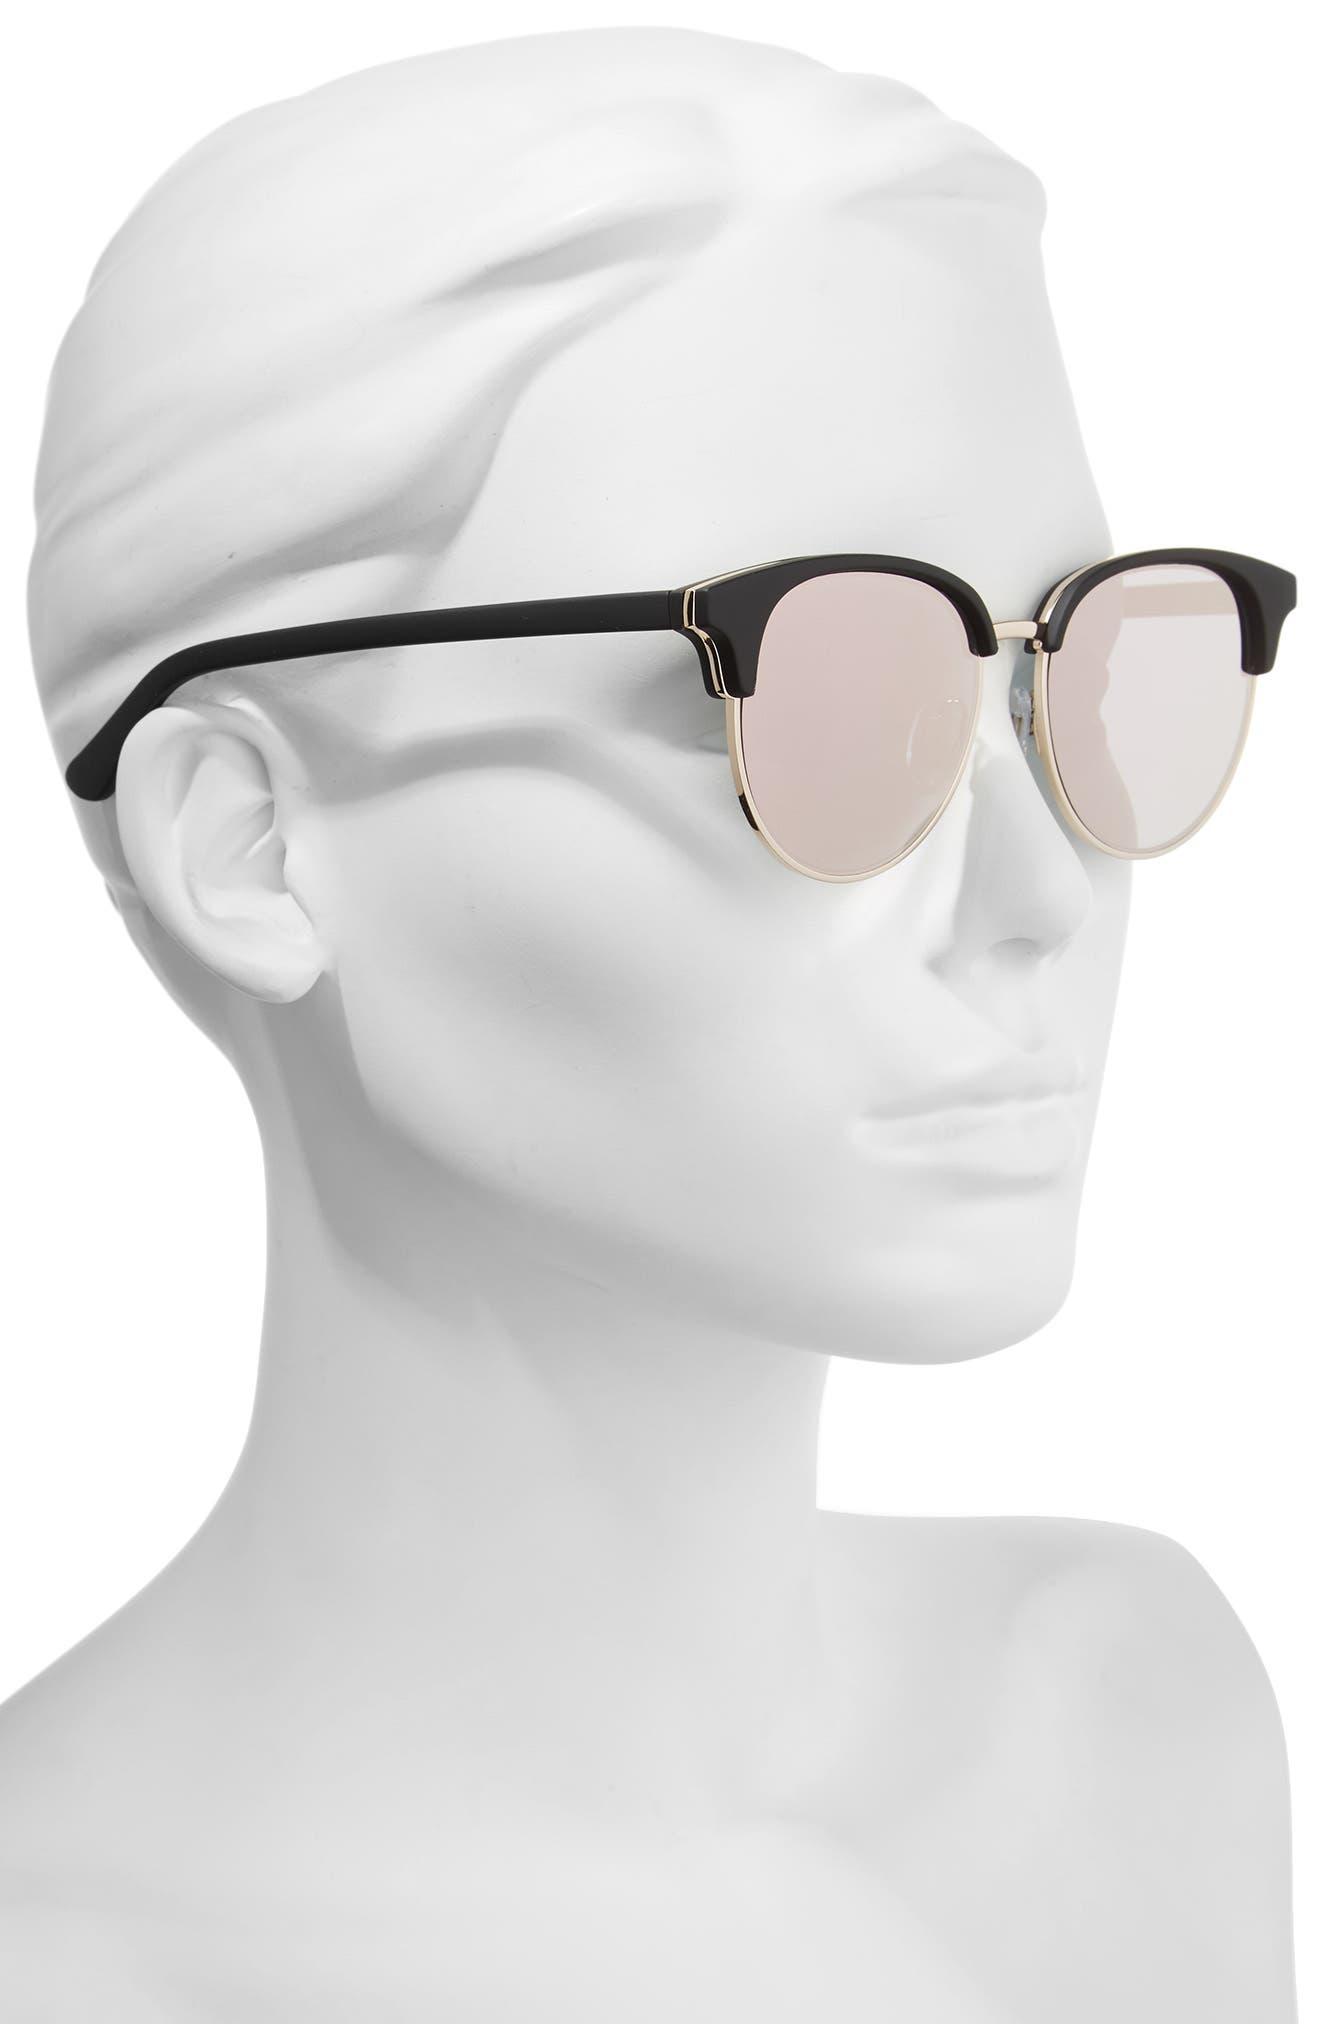 Deja Vu 51mm Round Sunglasses,                             Alternate thumbnail 2, color,                             001